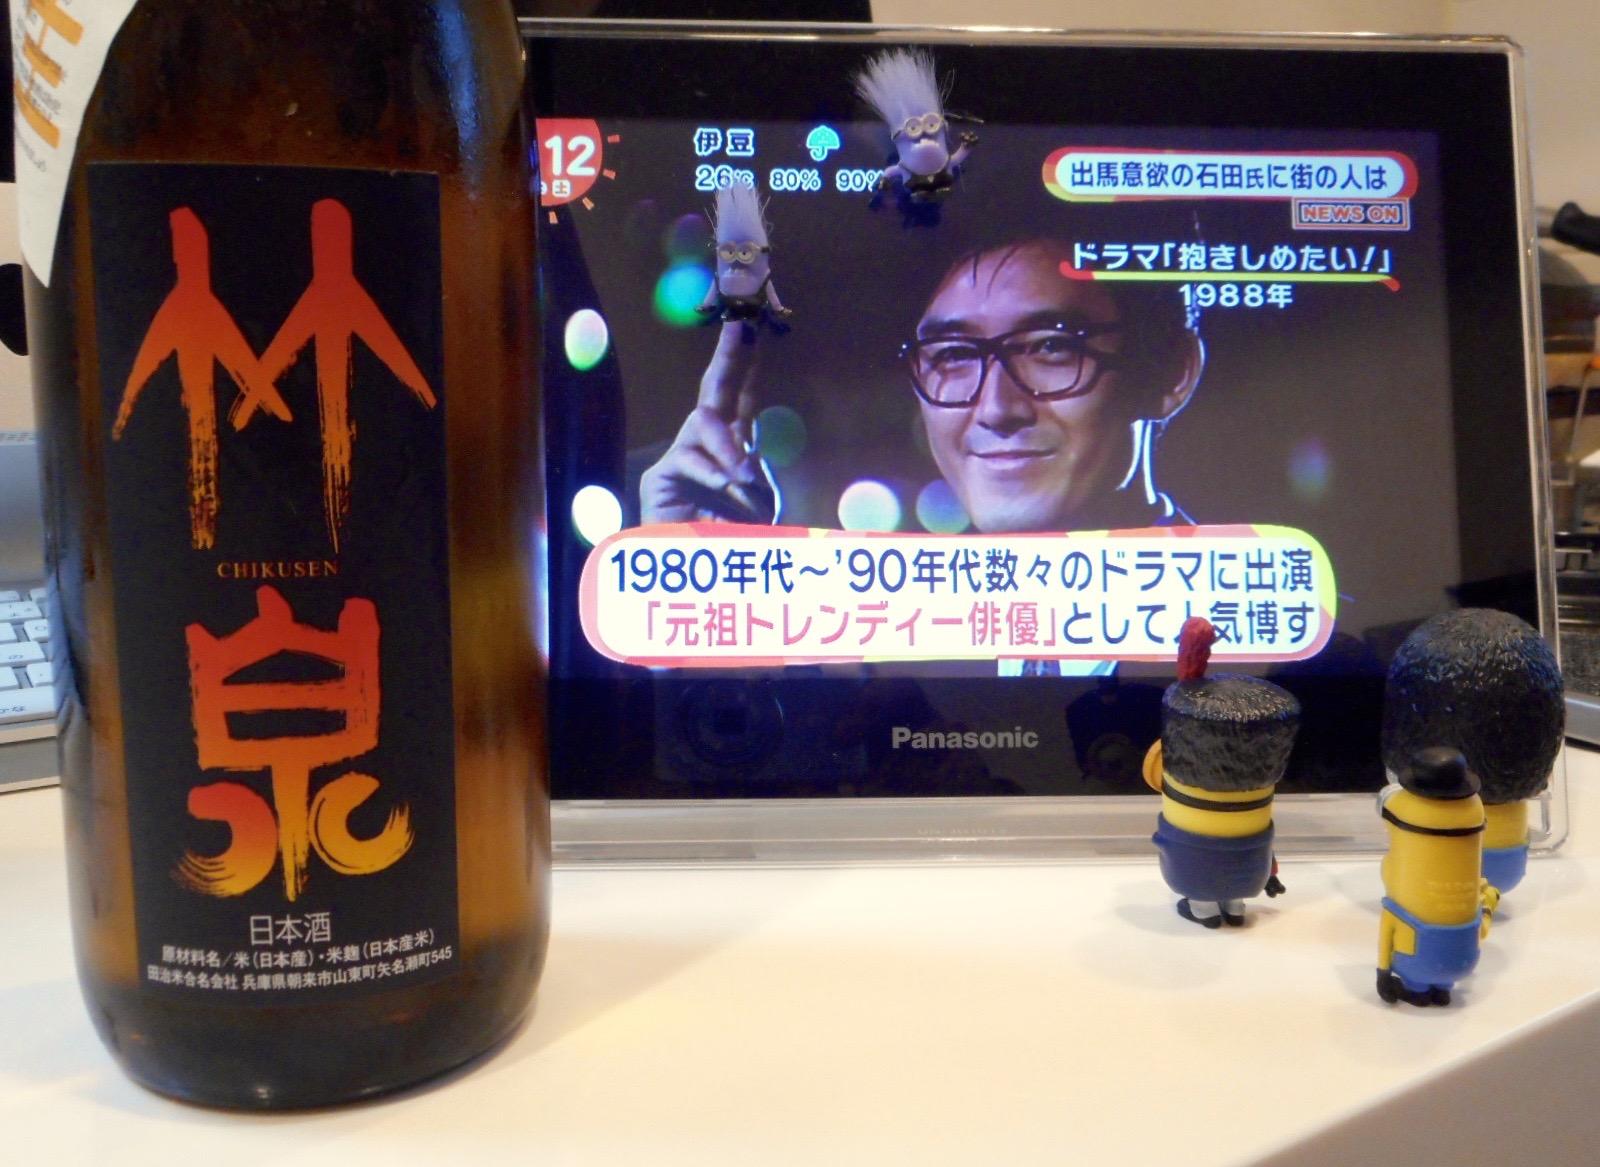 chikusen_omachi55nama1.jpg